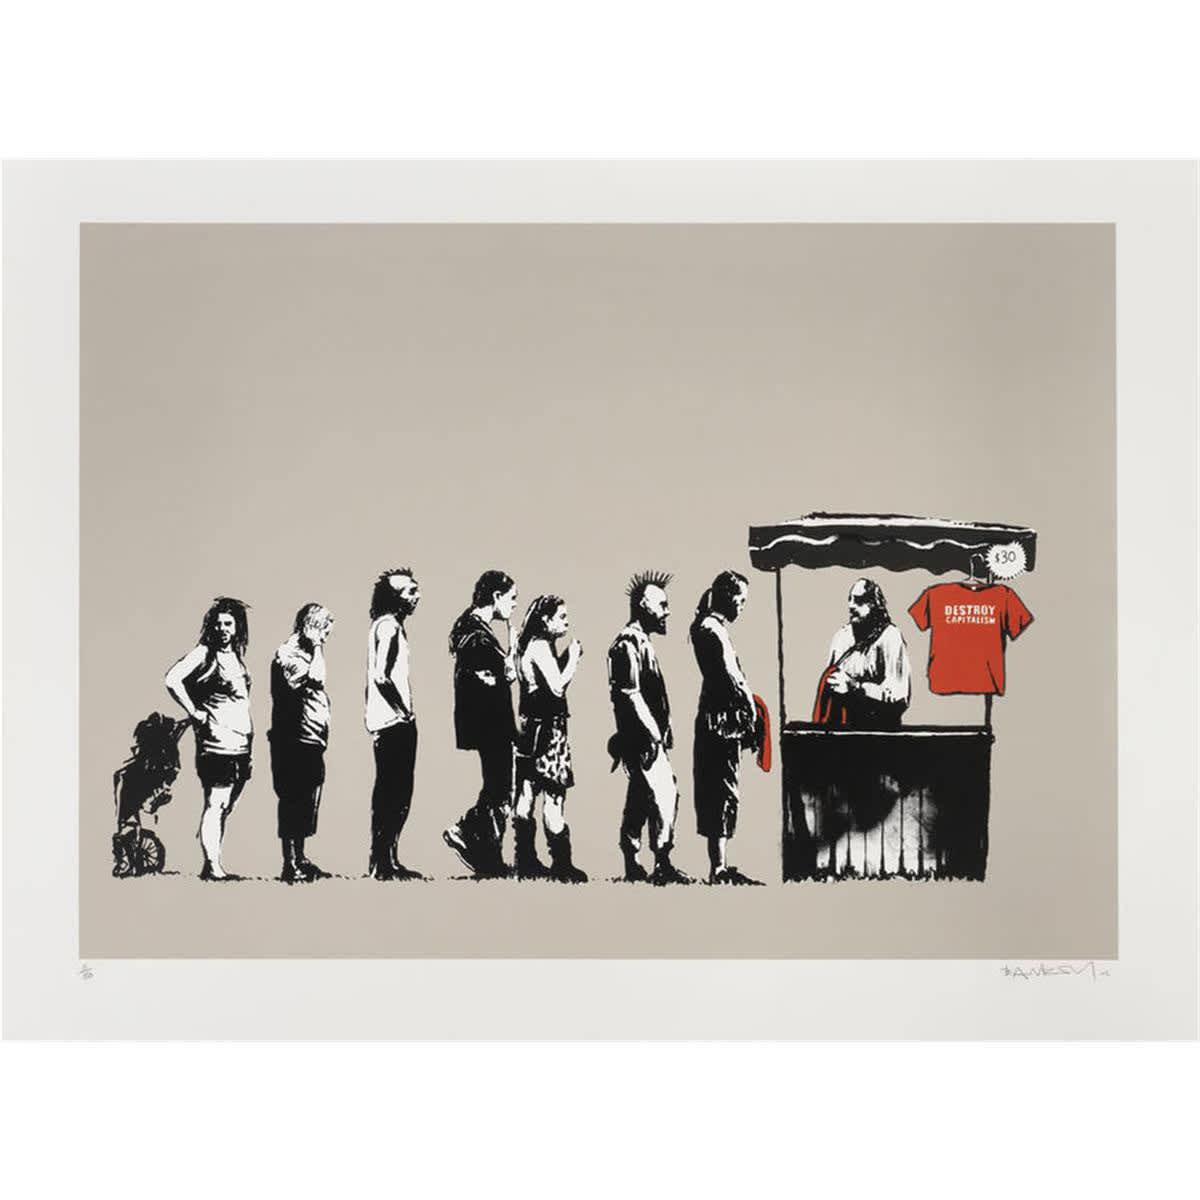 Banksy, Festival (Destroy Capitalism), 2006